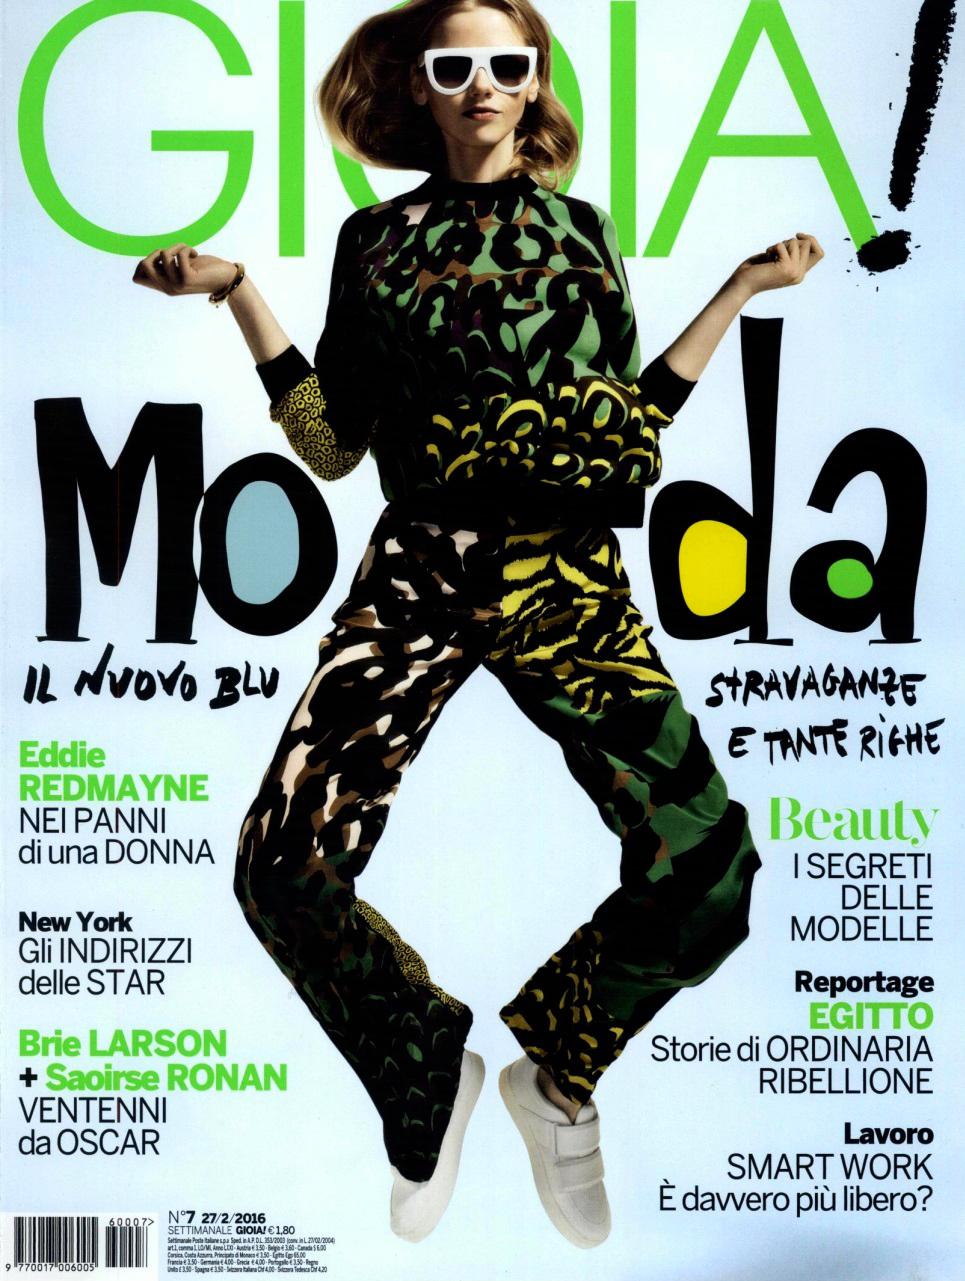 #VersaceEditorials - Energetic glam. Gioia Italy - February '16 #Versace Stylist: Monica Curetti Photographer: Marco La Conte